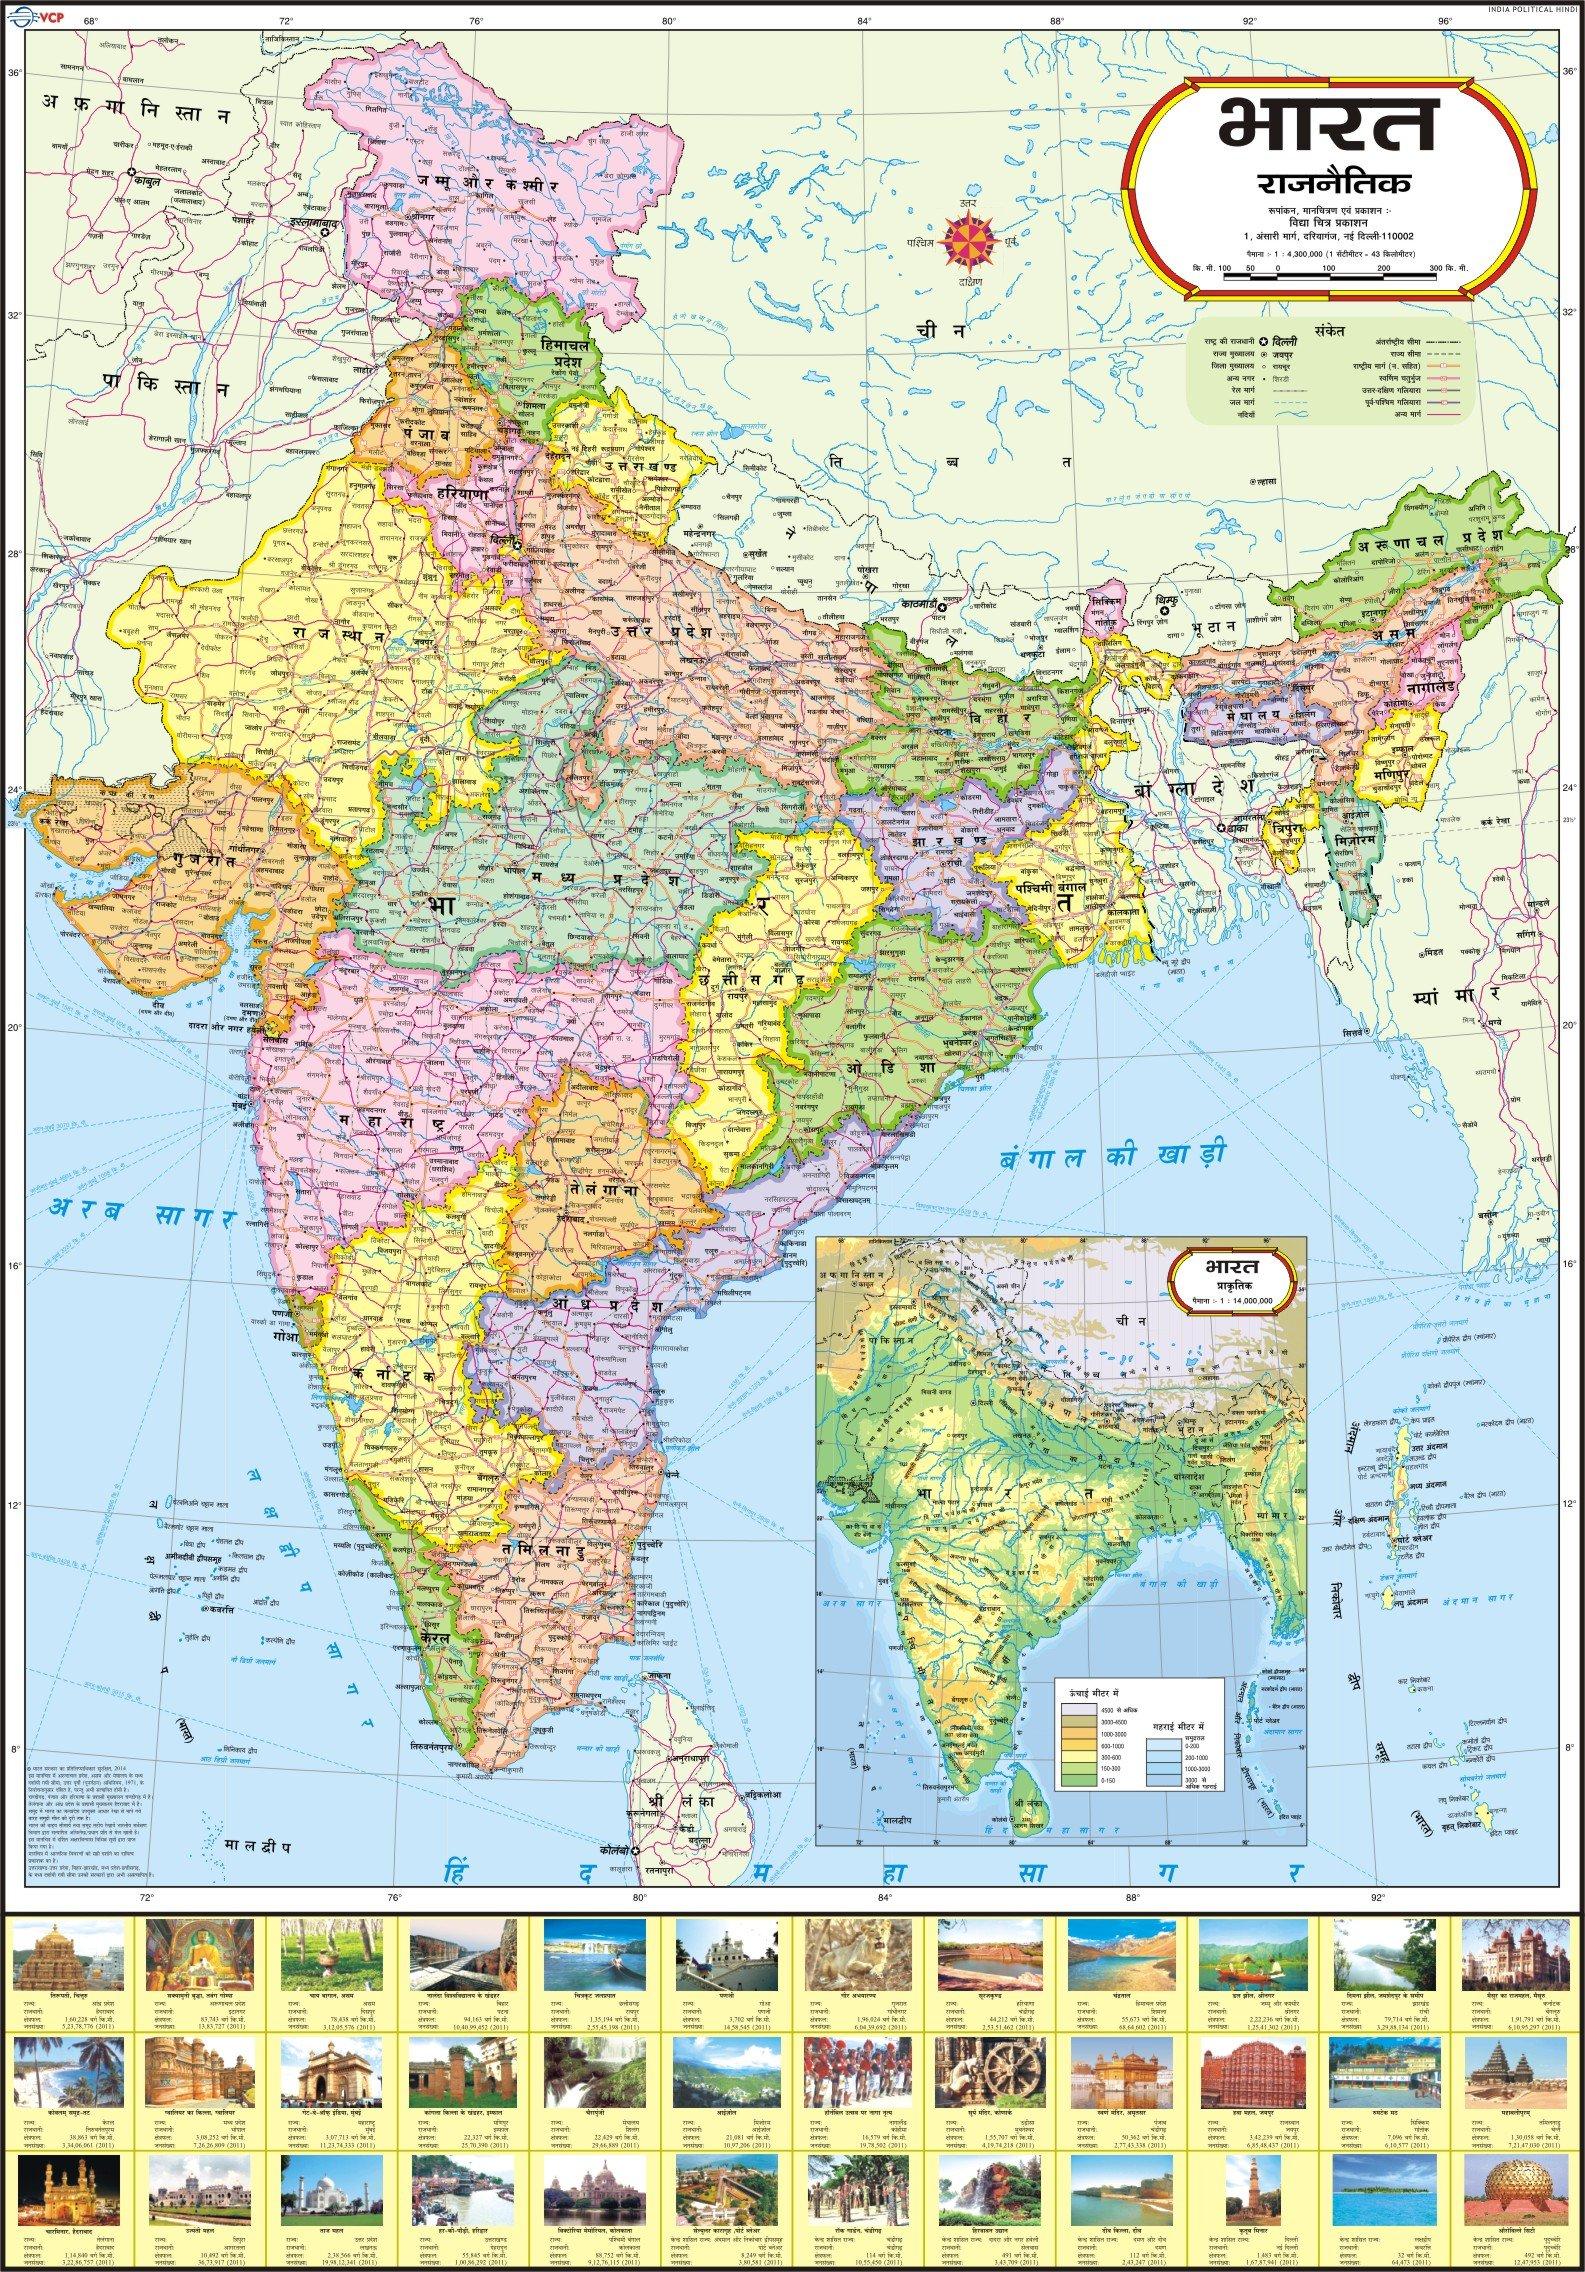 Buy india political map hindi book online at low prices in india buy india political map hindi book online at low prices in india india political map hindi reviews ratings amazon gumiabroncs Images